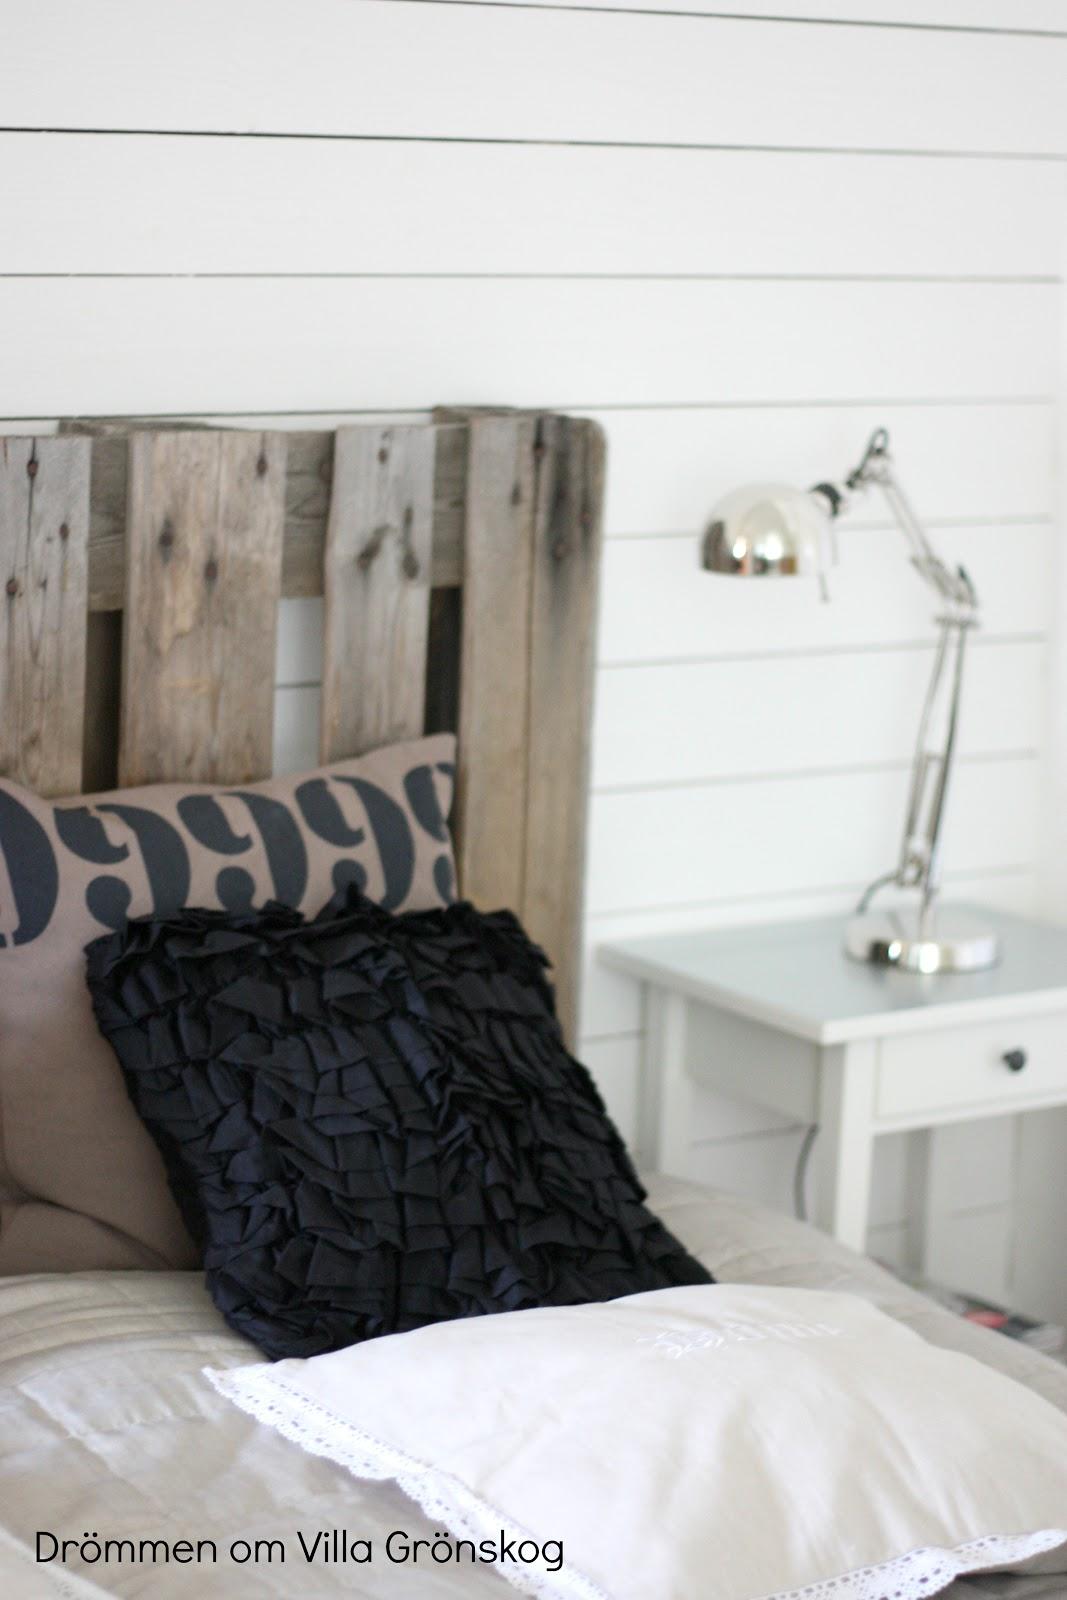 Drömmen om villa grönskog: sovrum....